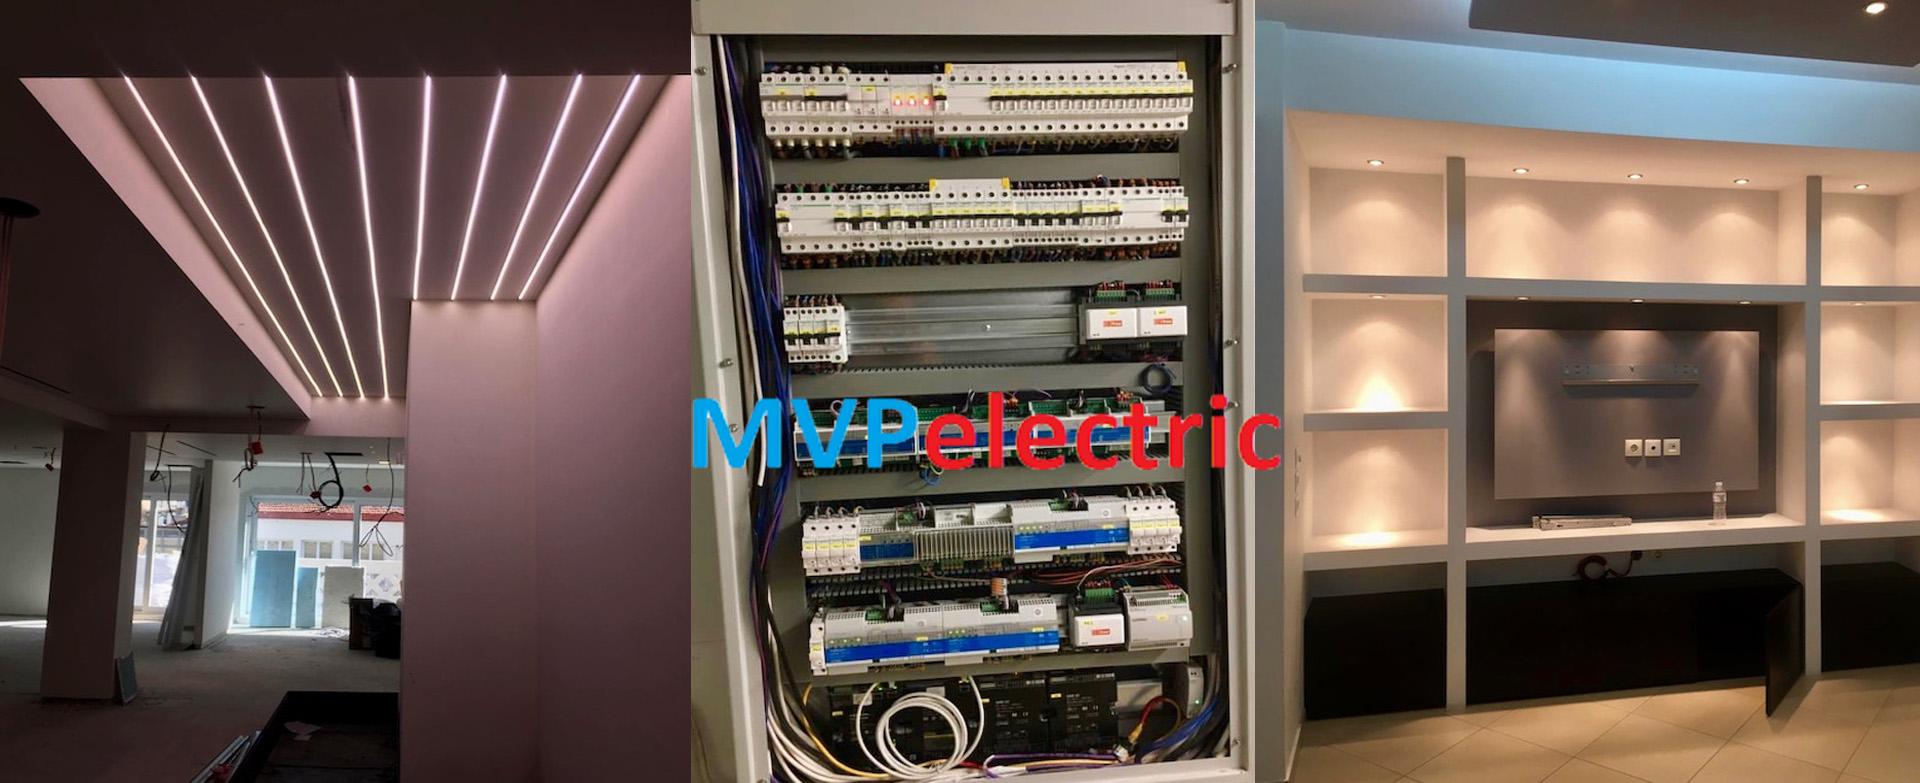 mvp electric